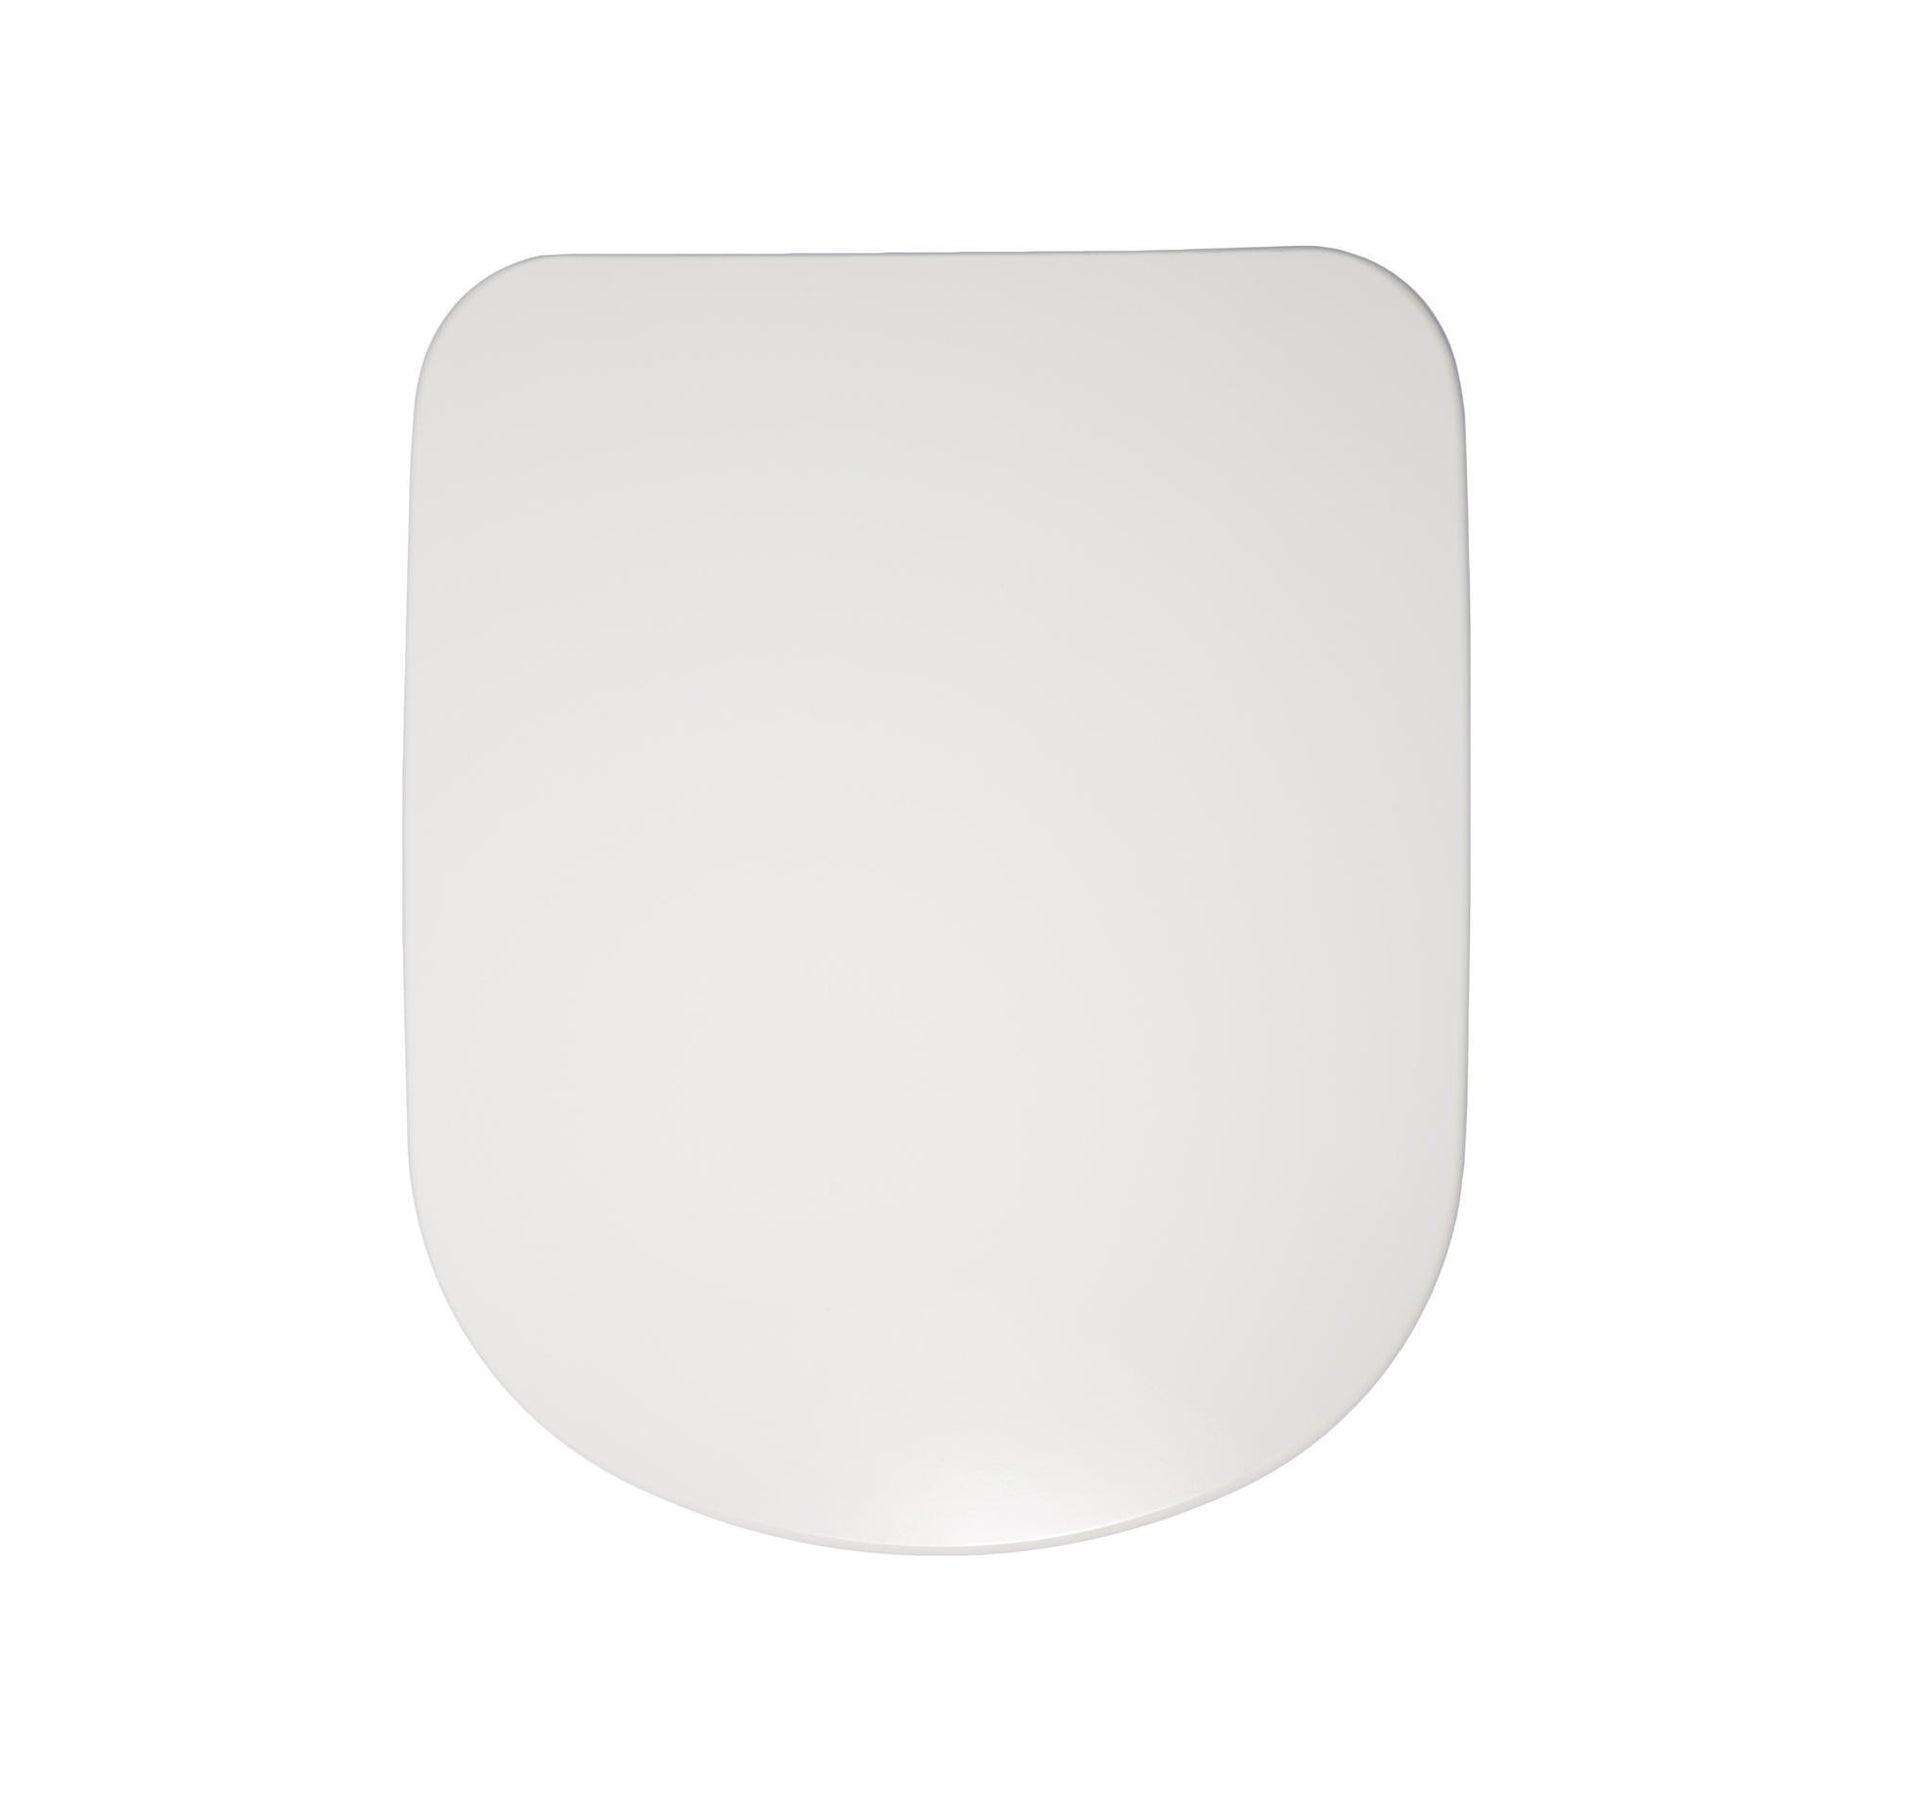 Copriwater ovale Originale per serie sanitari Gemma 2 IDEAL STANDARD termoindurente bianco - 7